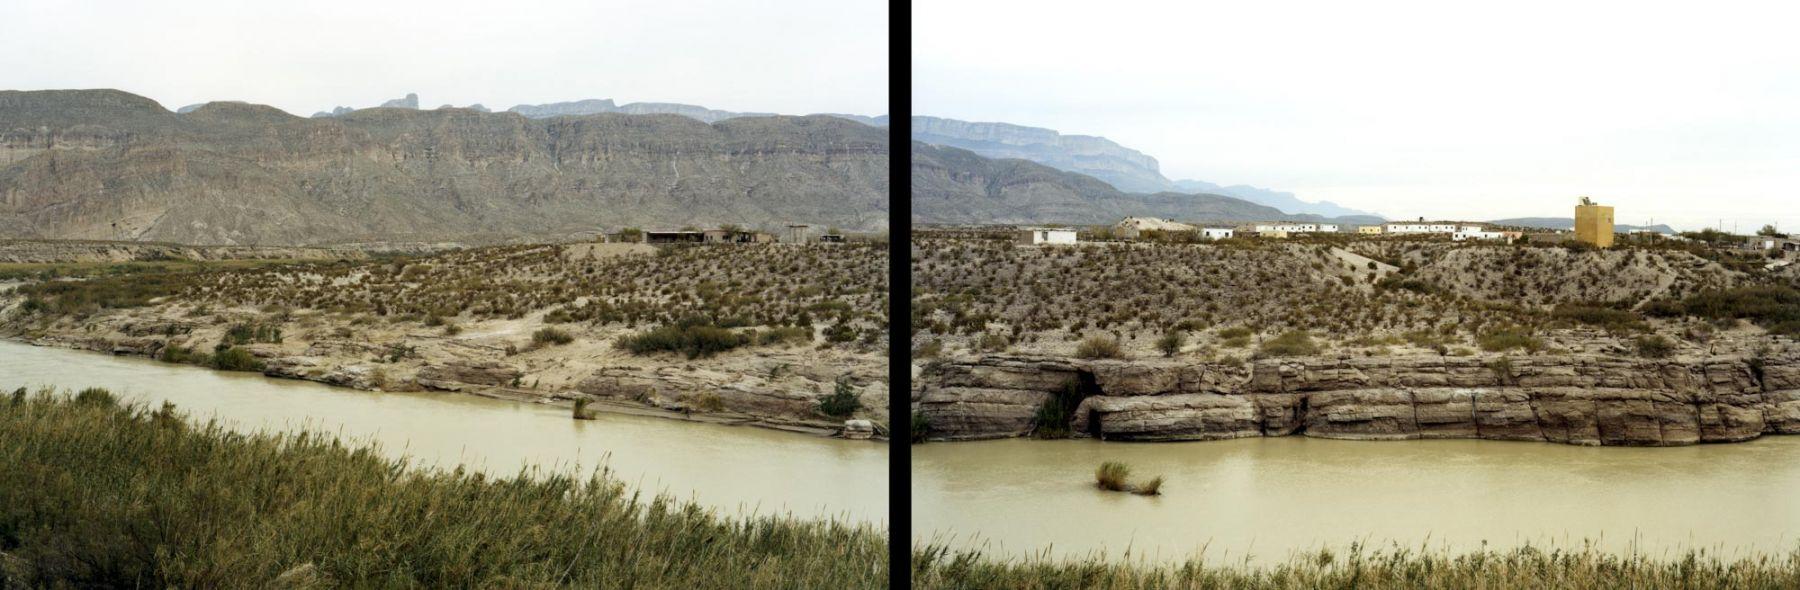 Untitled (Boquillas del Carmen), Big Bend National Park, 2009, 2 39 x 55 inch chromogenic prints